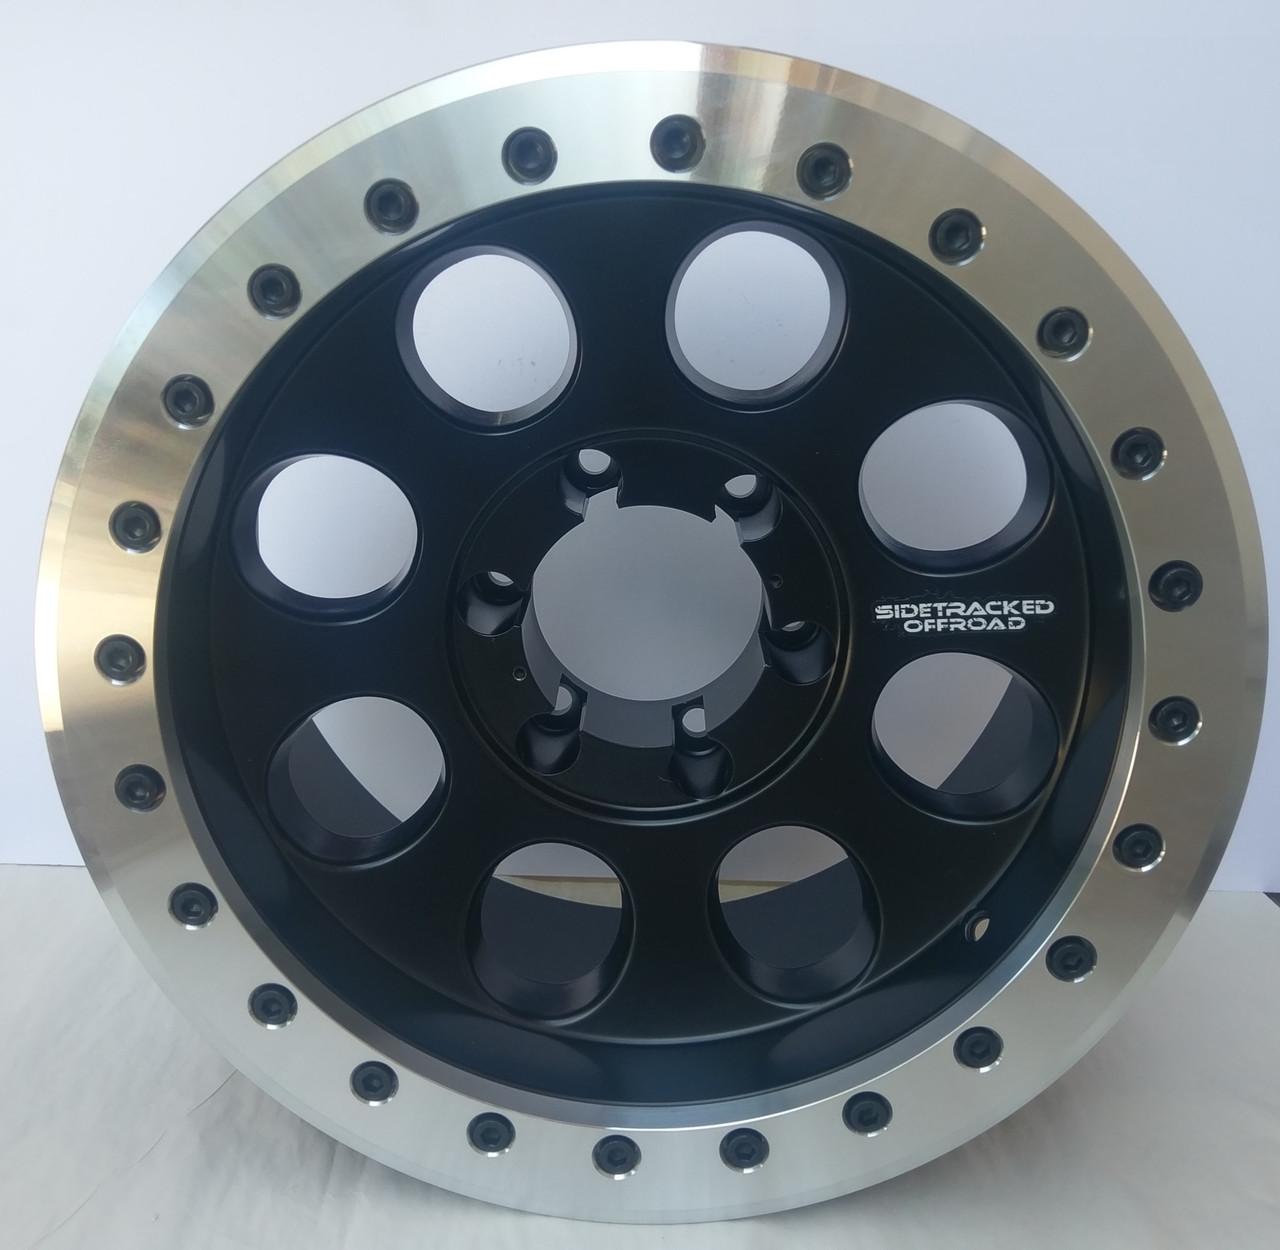 Sidetracked Aluminum Beadlock Wheel